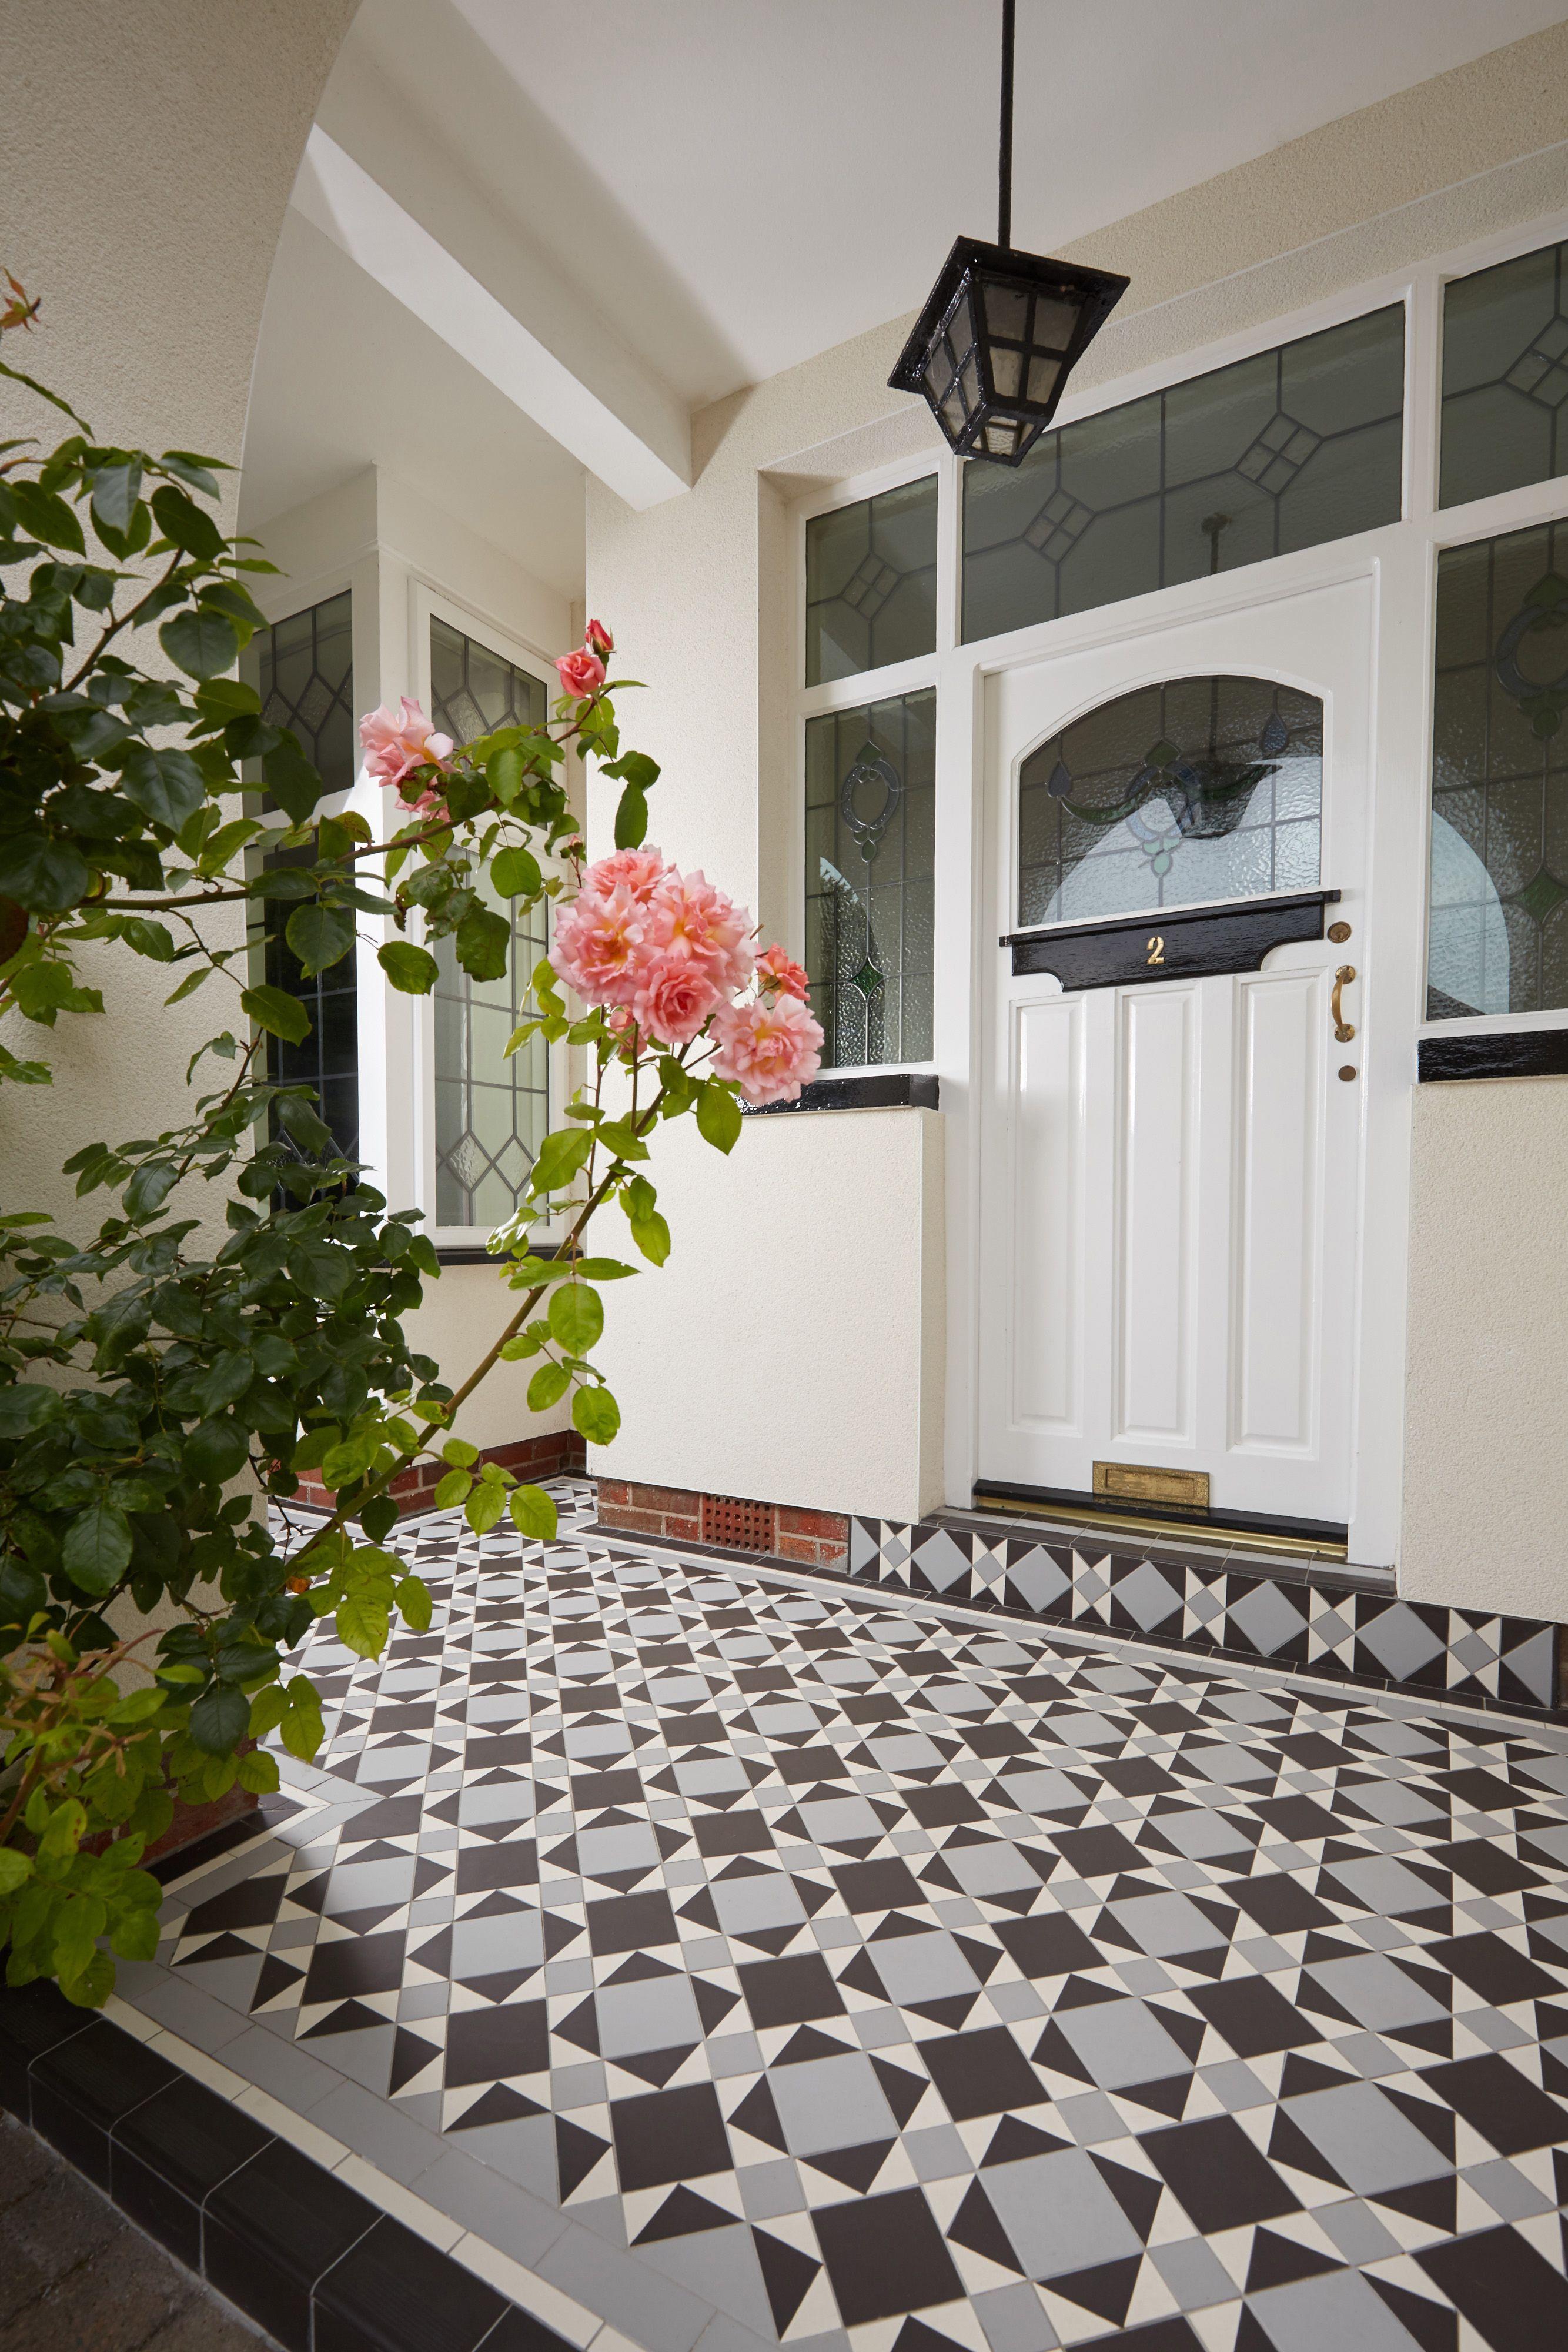 The Lambeth Pattern Victorian Floor Tiles By Original Style Uk V